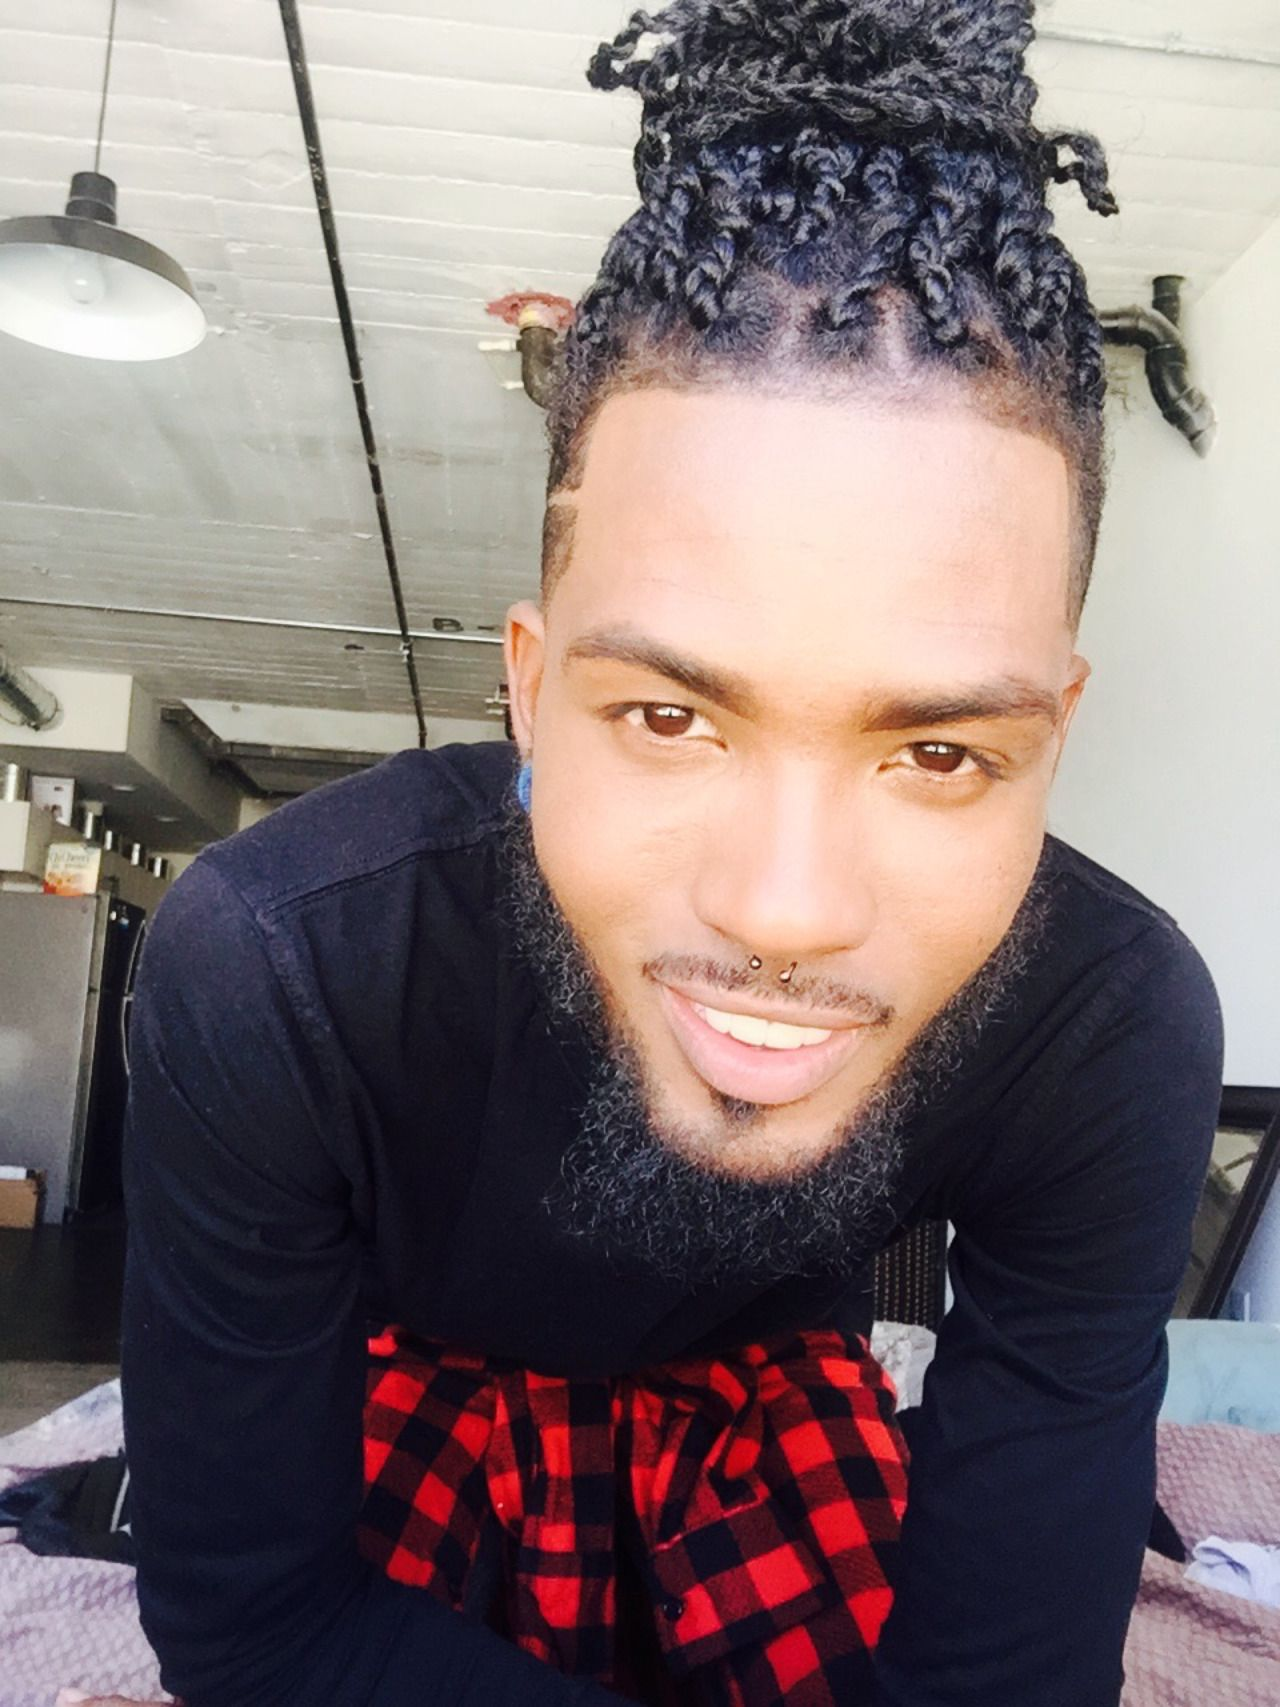 Black men hair line images colors as well hair studio design ideas - Black Men Are Beautiful